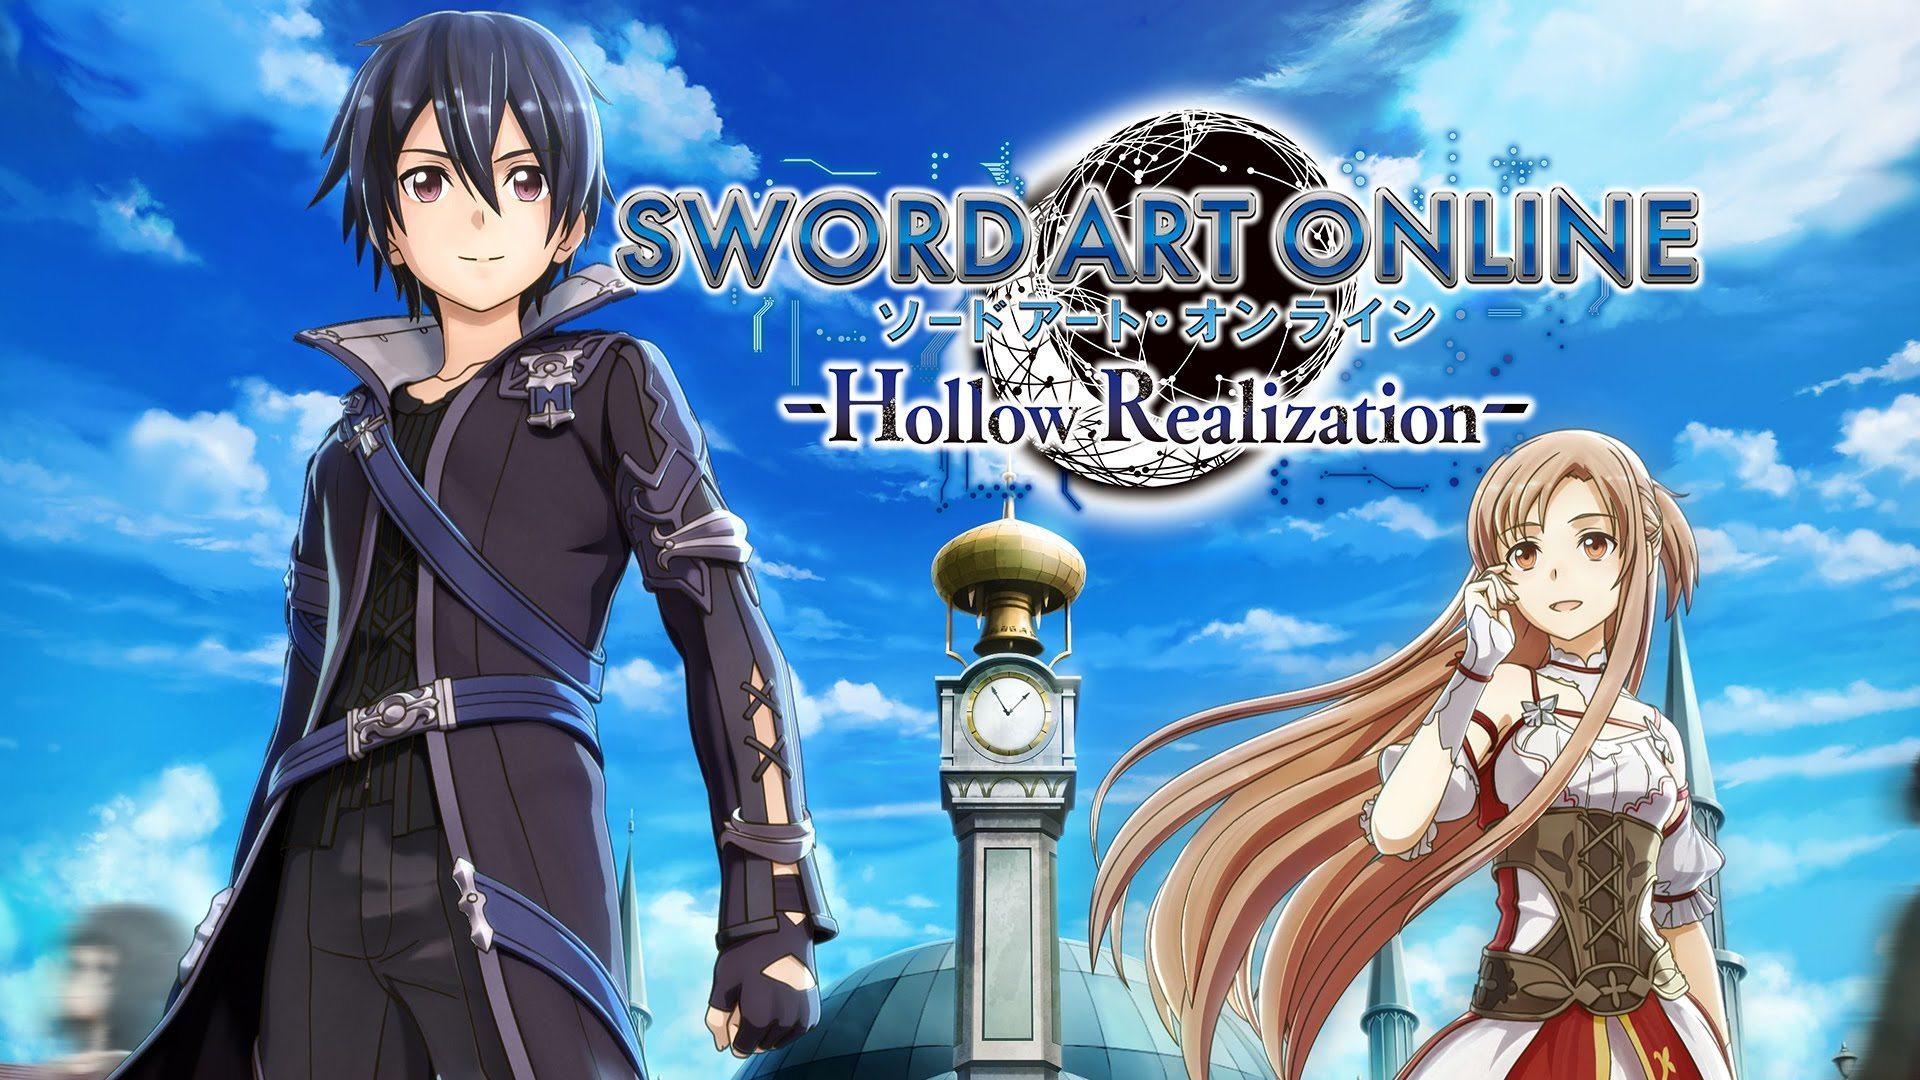 Sword Art Online: Hollow Realization trailer released - That